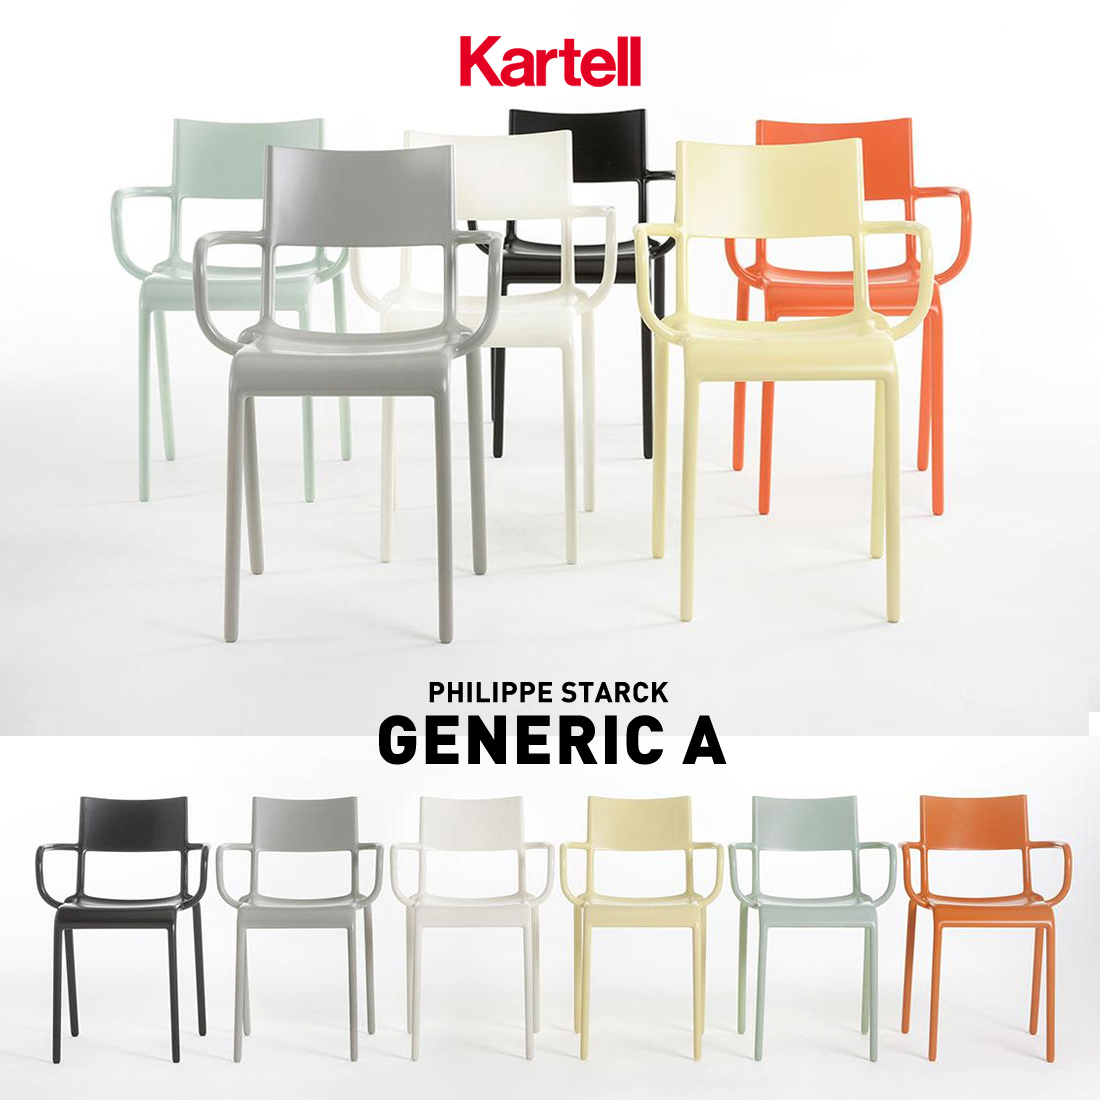 【kartell カルテル】Generic A ジェネリックAフィリップ・スタルク SFCH-K5814 スタッキング可 椅子 4本足 アームチェア